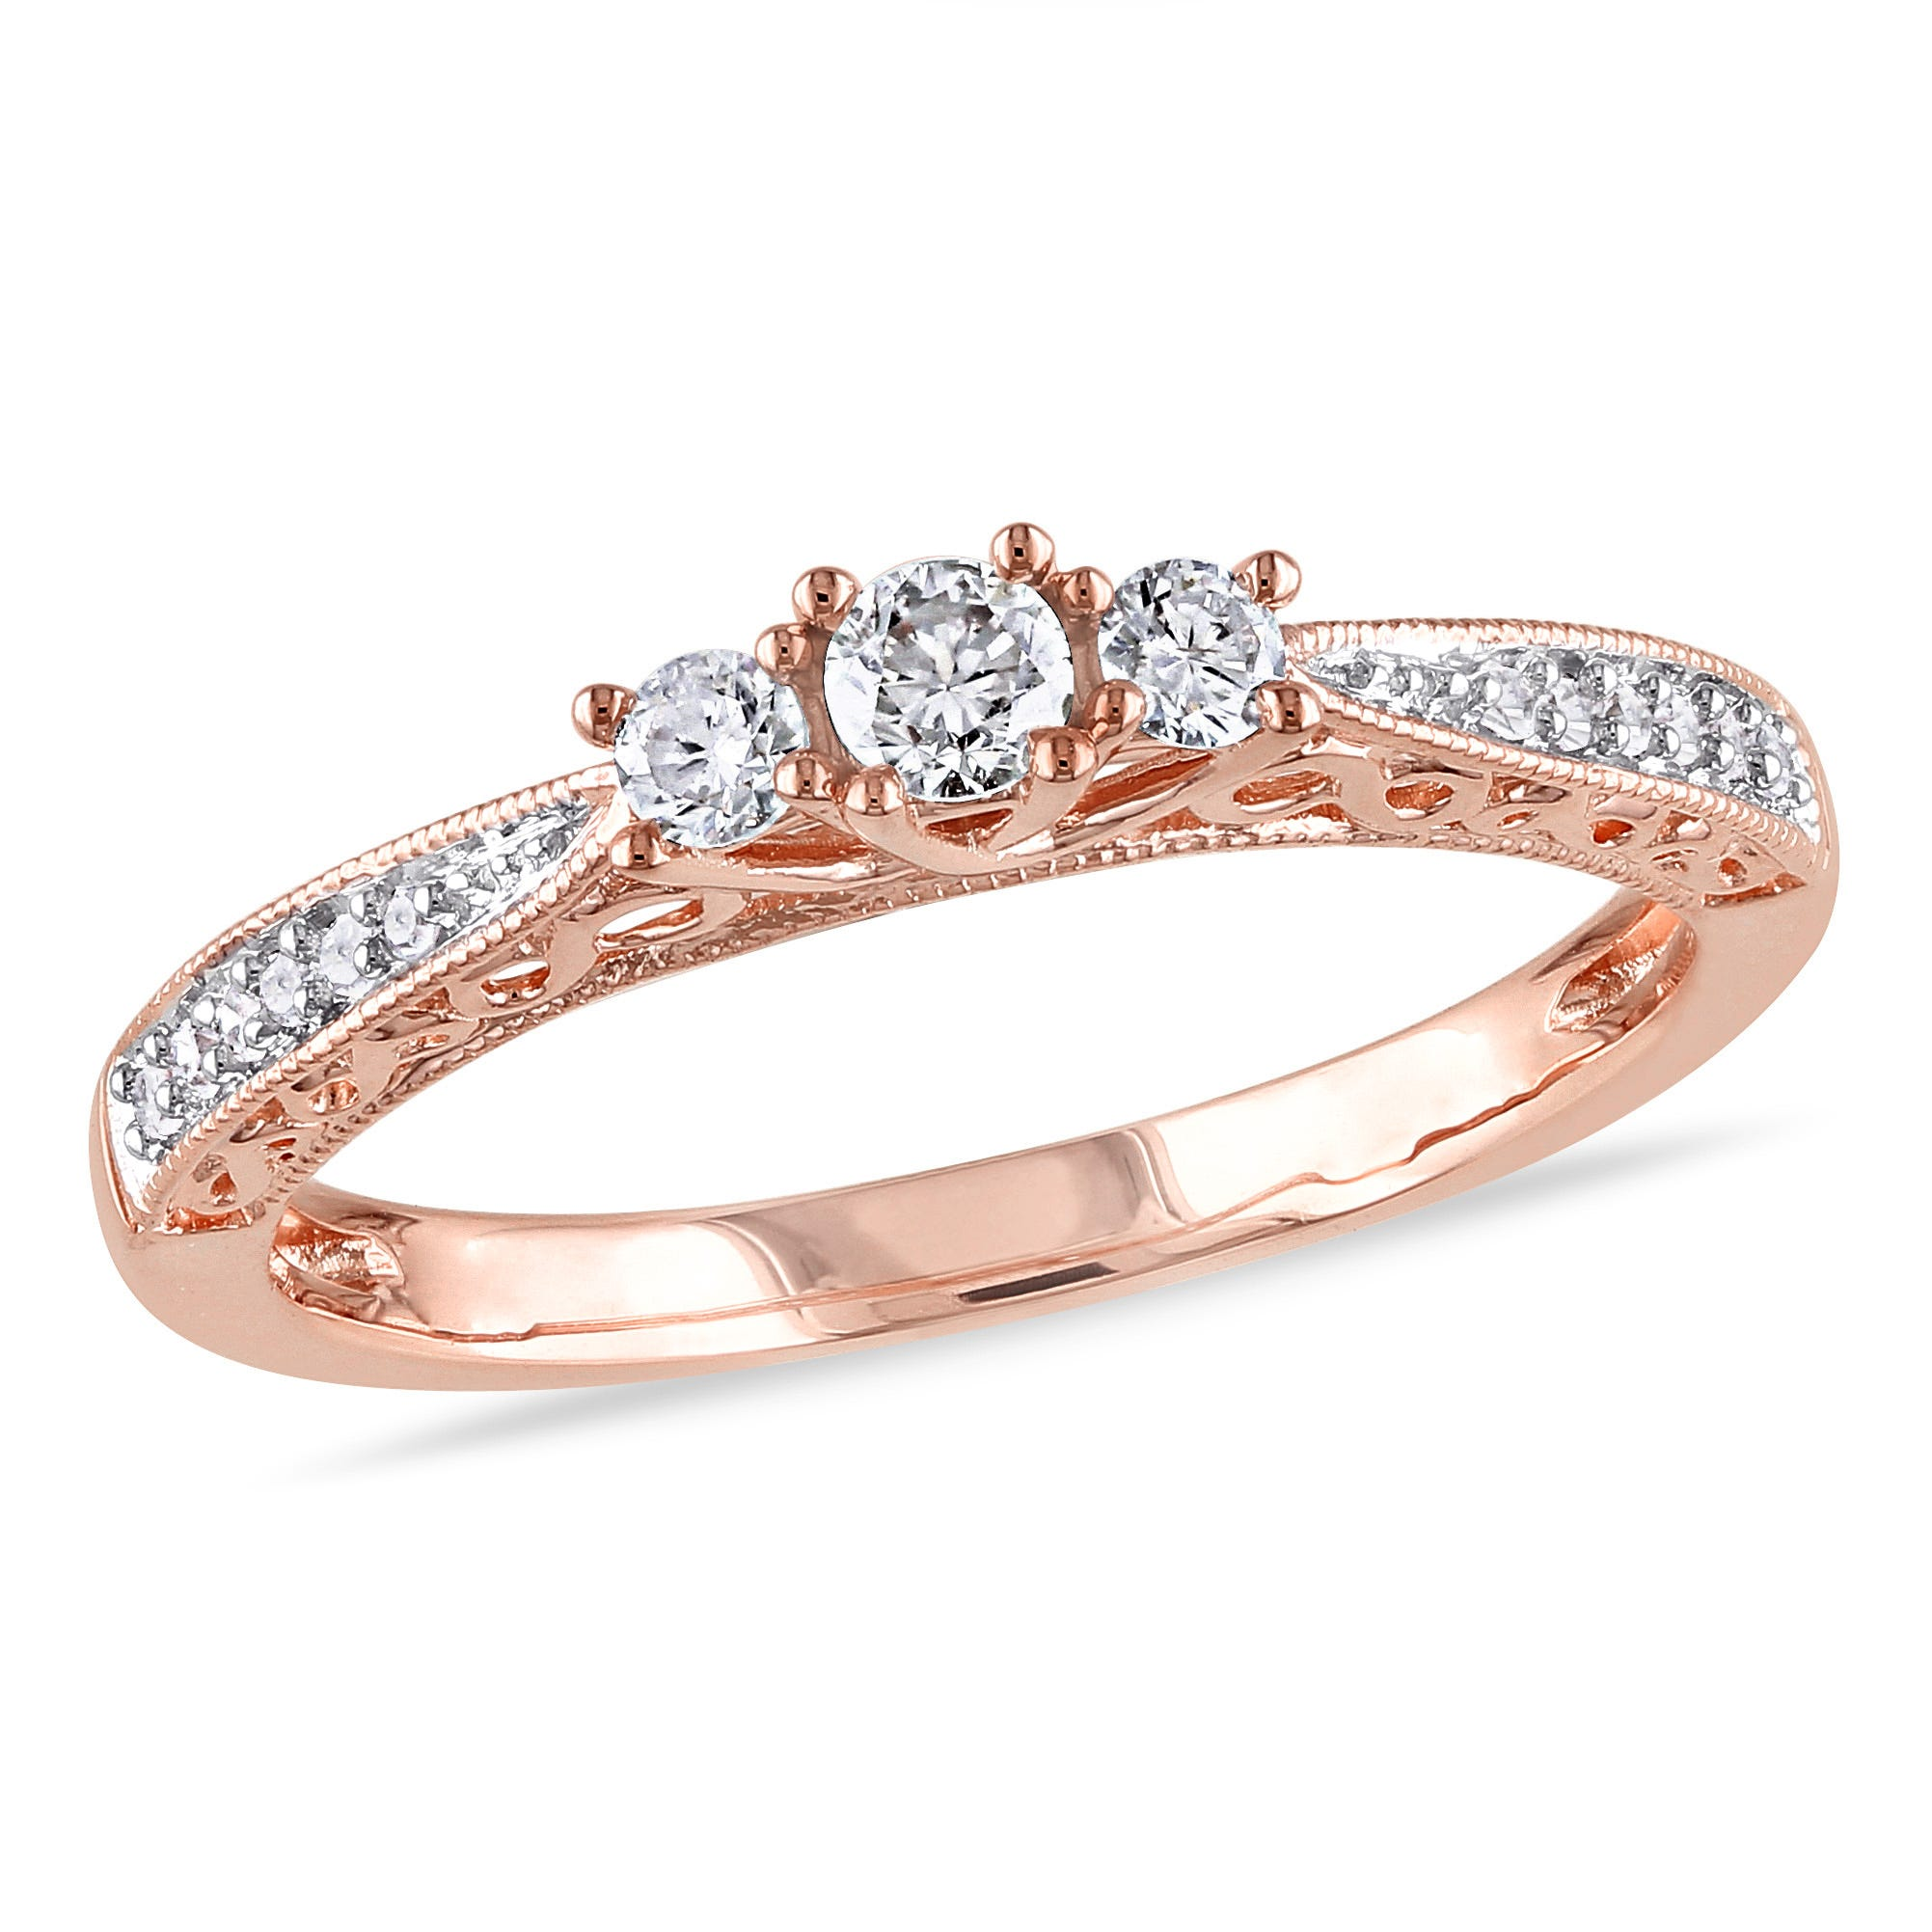 Round Cut Diamond 3-Stone Promise Ring 1/4ctw. in 10k Rose Gold